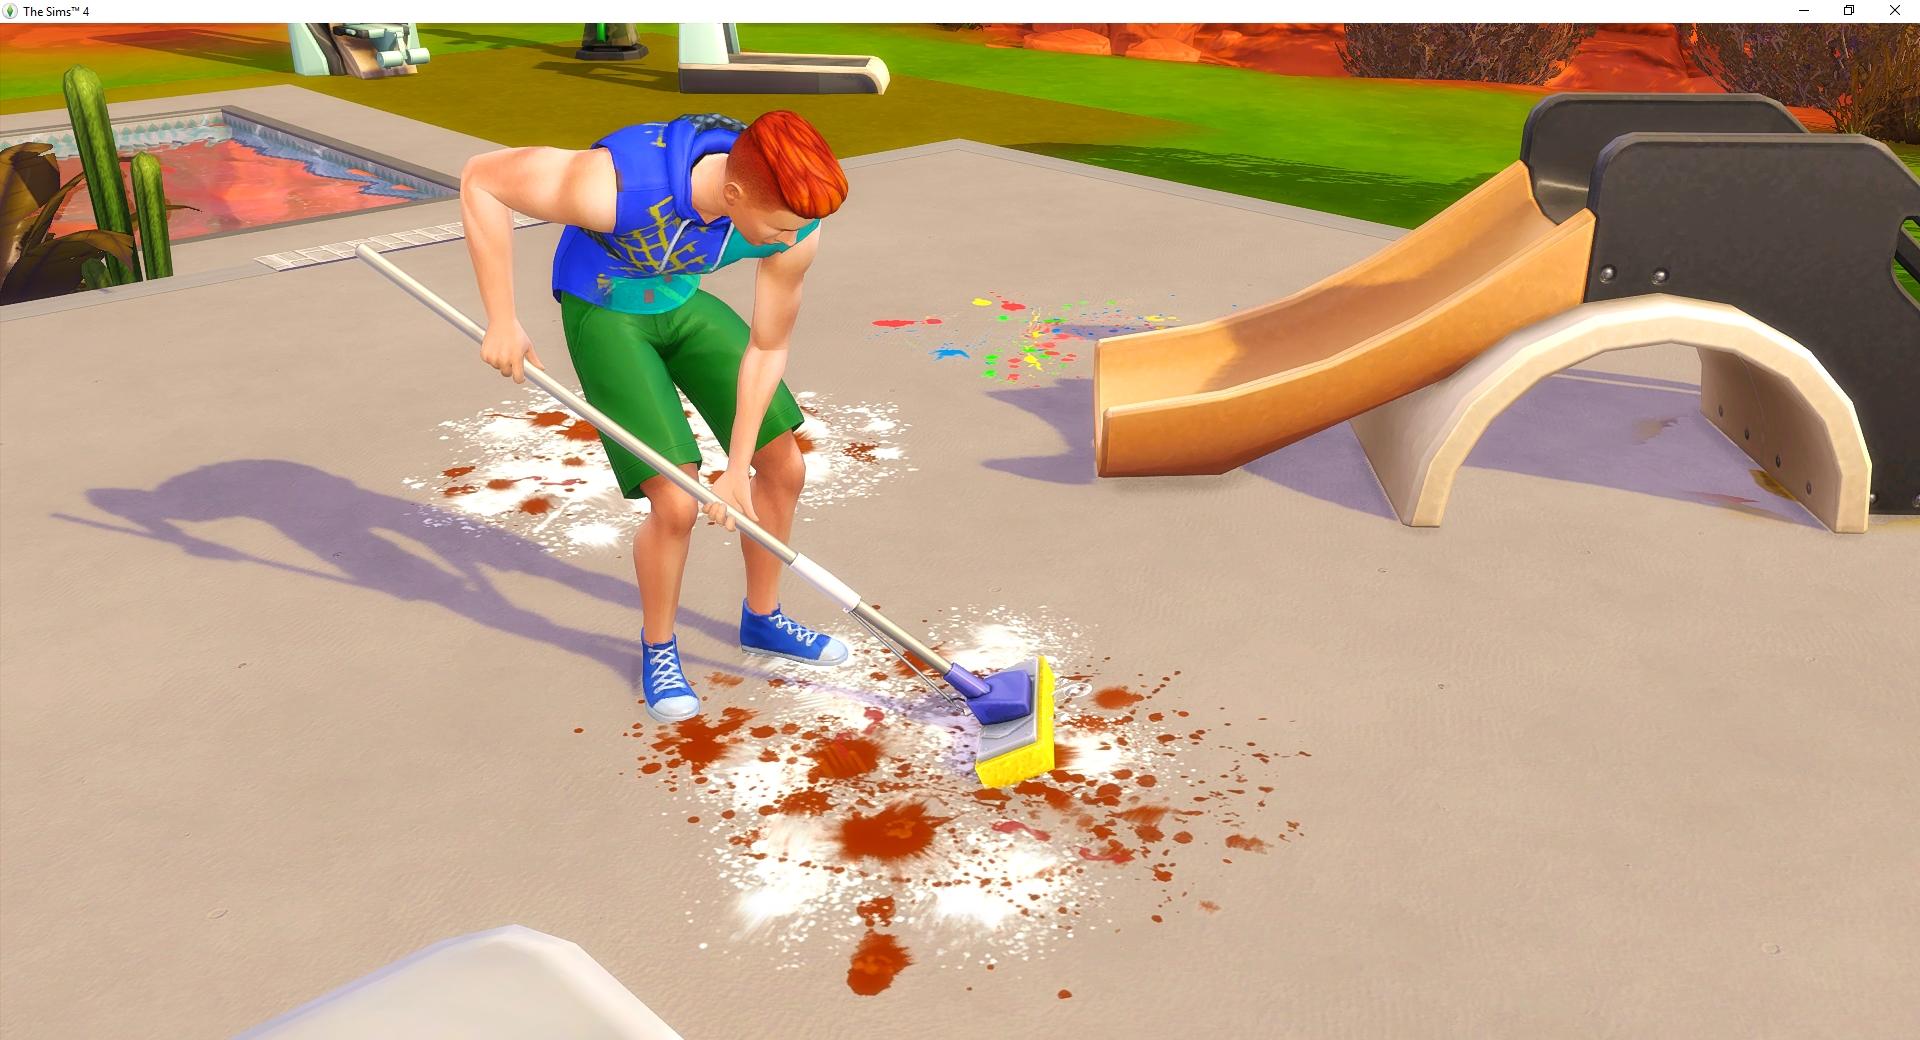 Masterful Sims: Toddler Goals